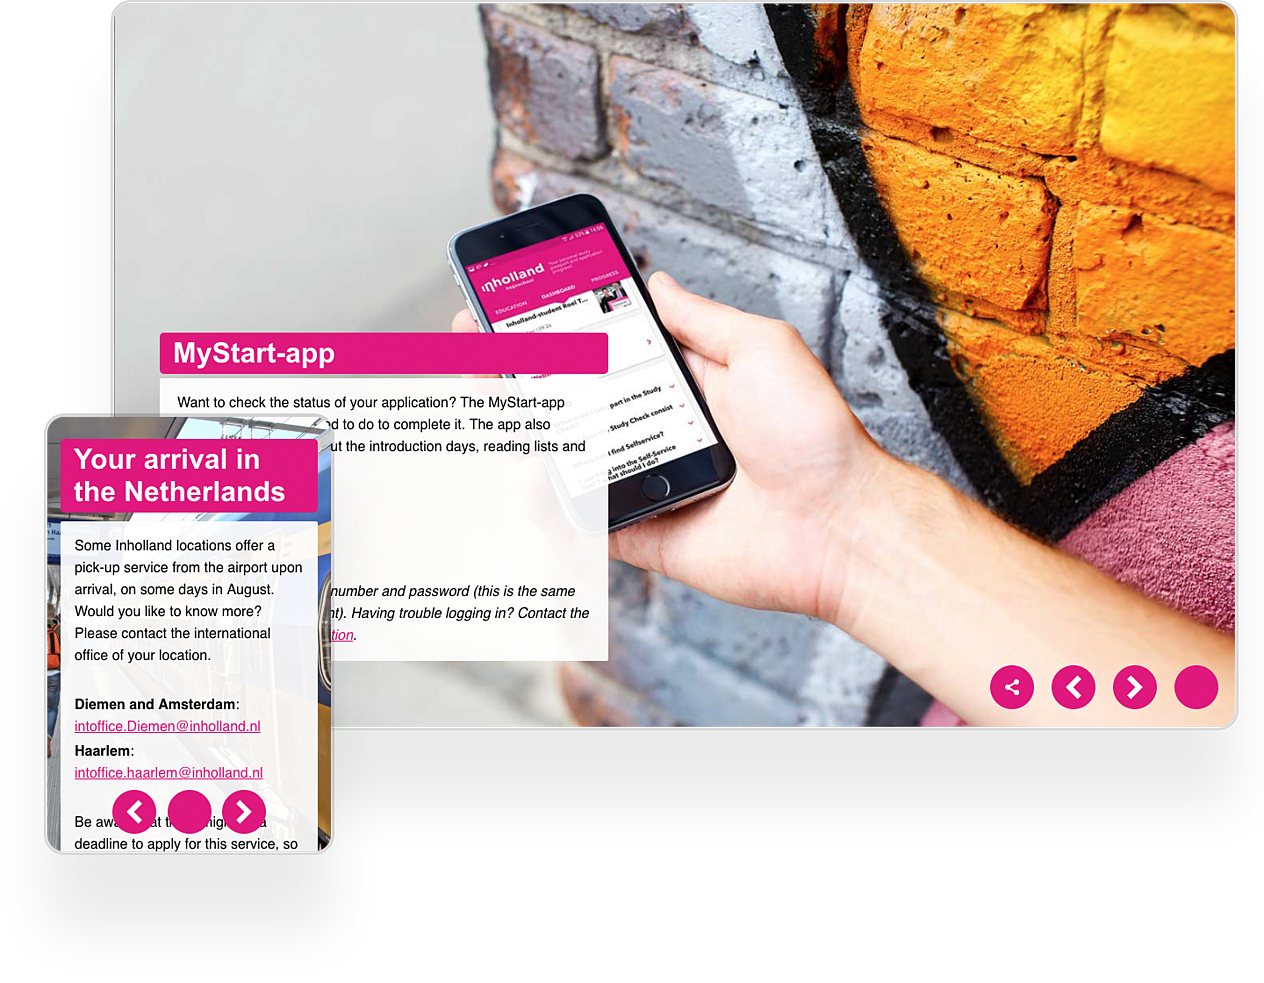 Interactive magazines remain a big hit among university students